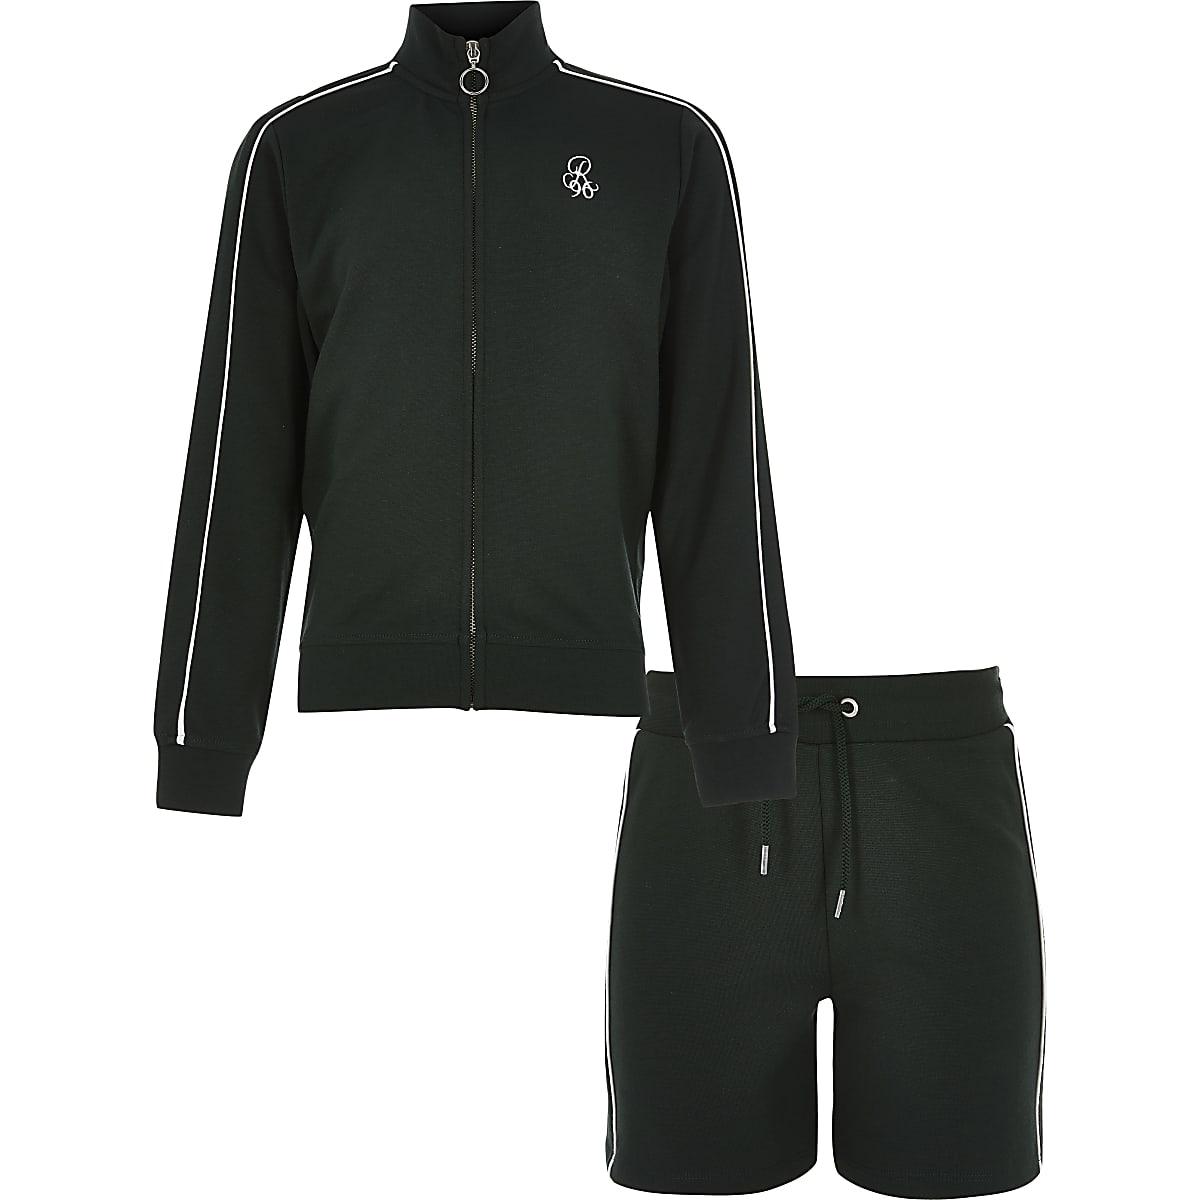 Boys khaki track top outfit